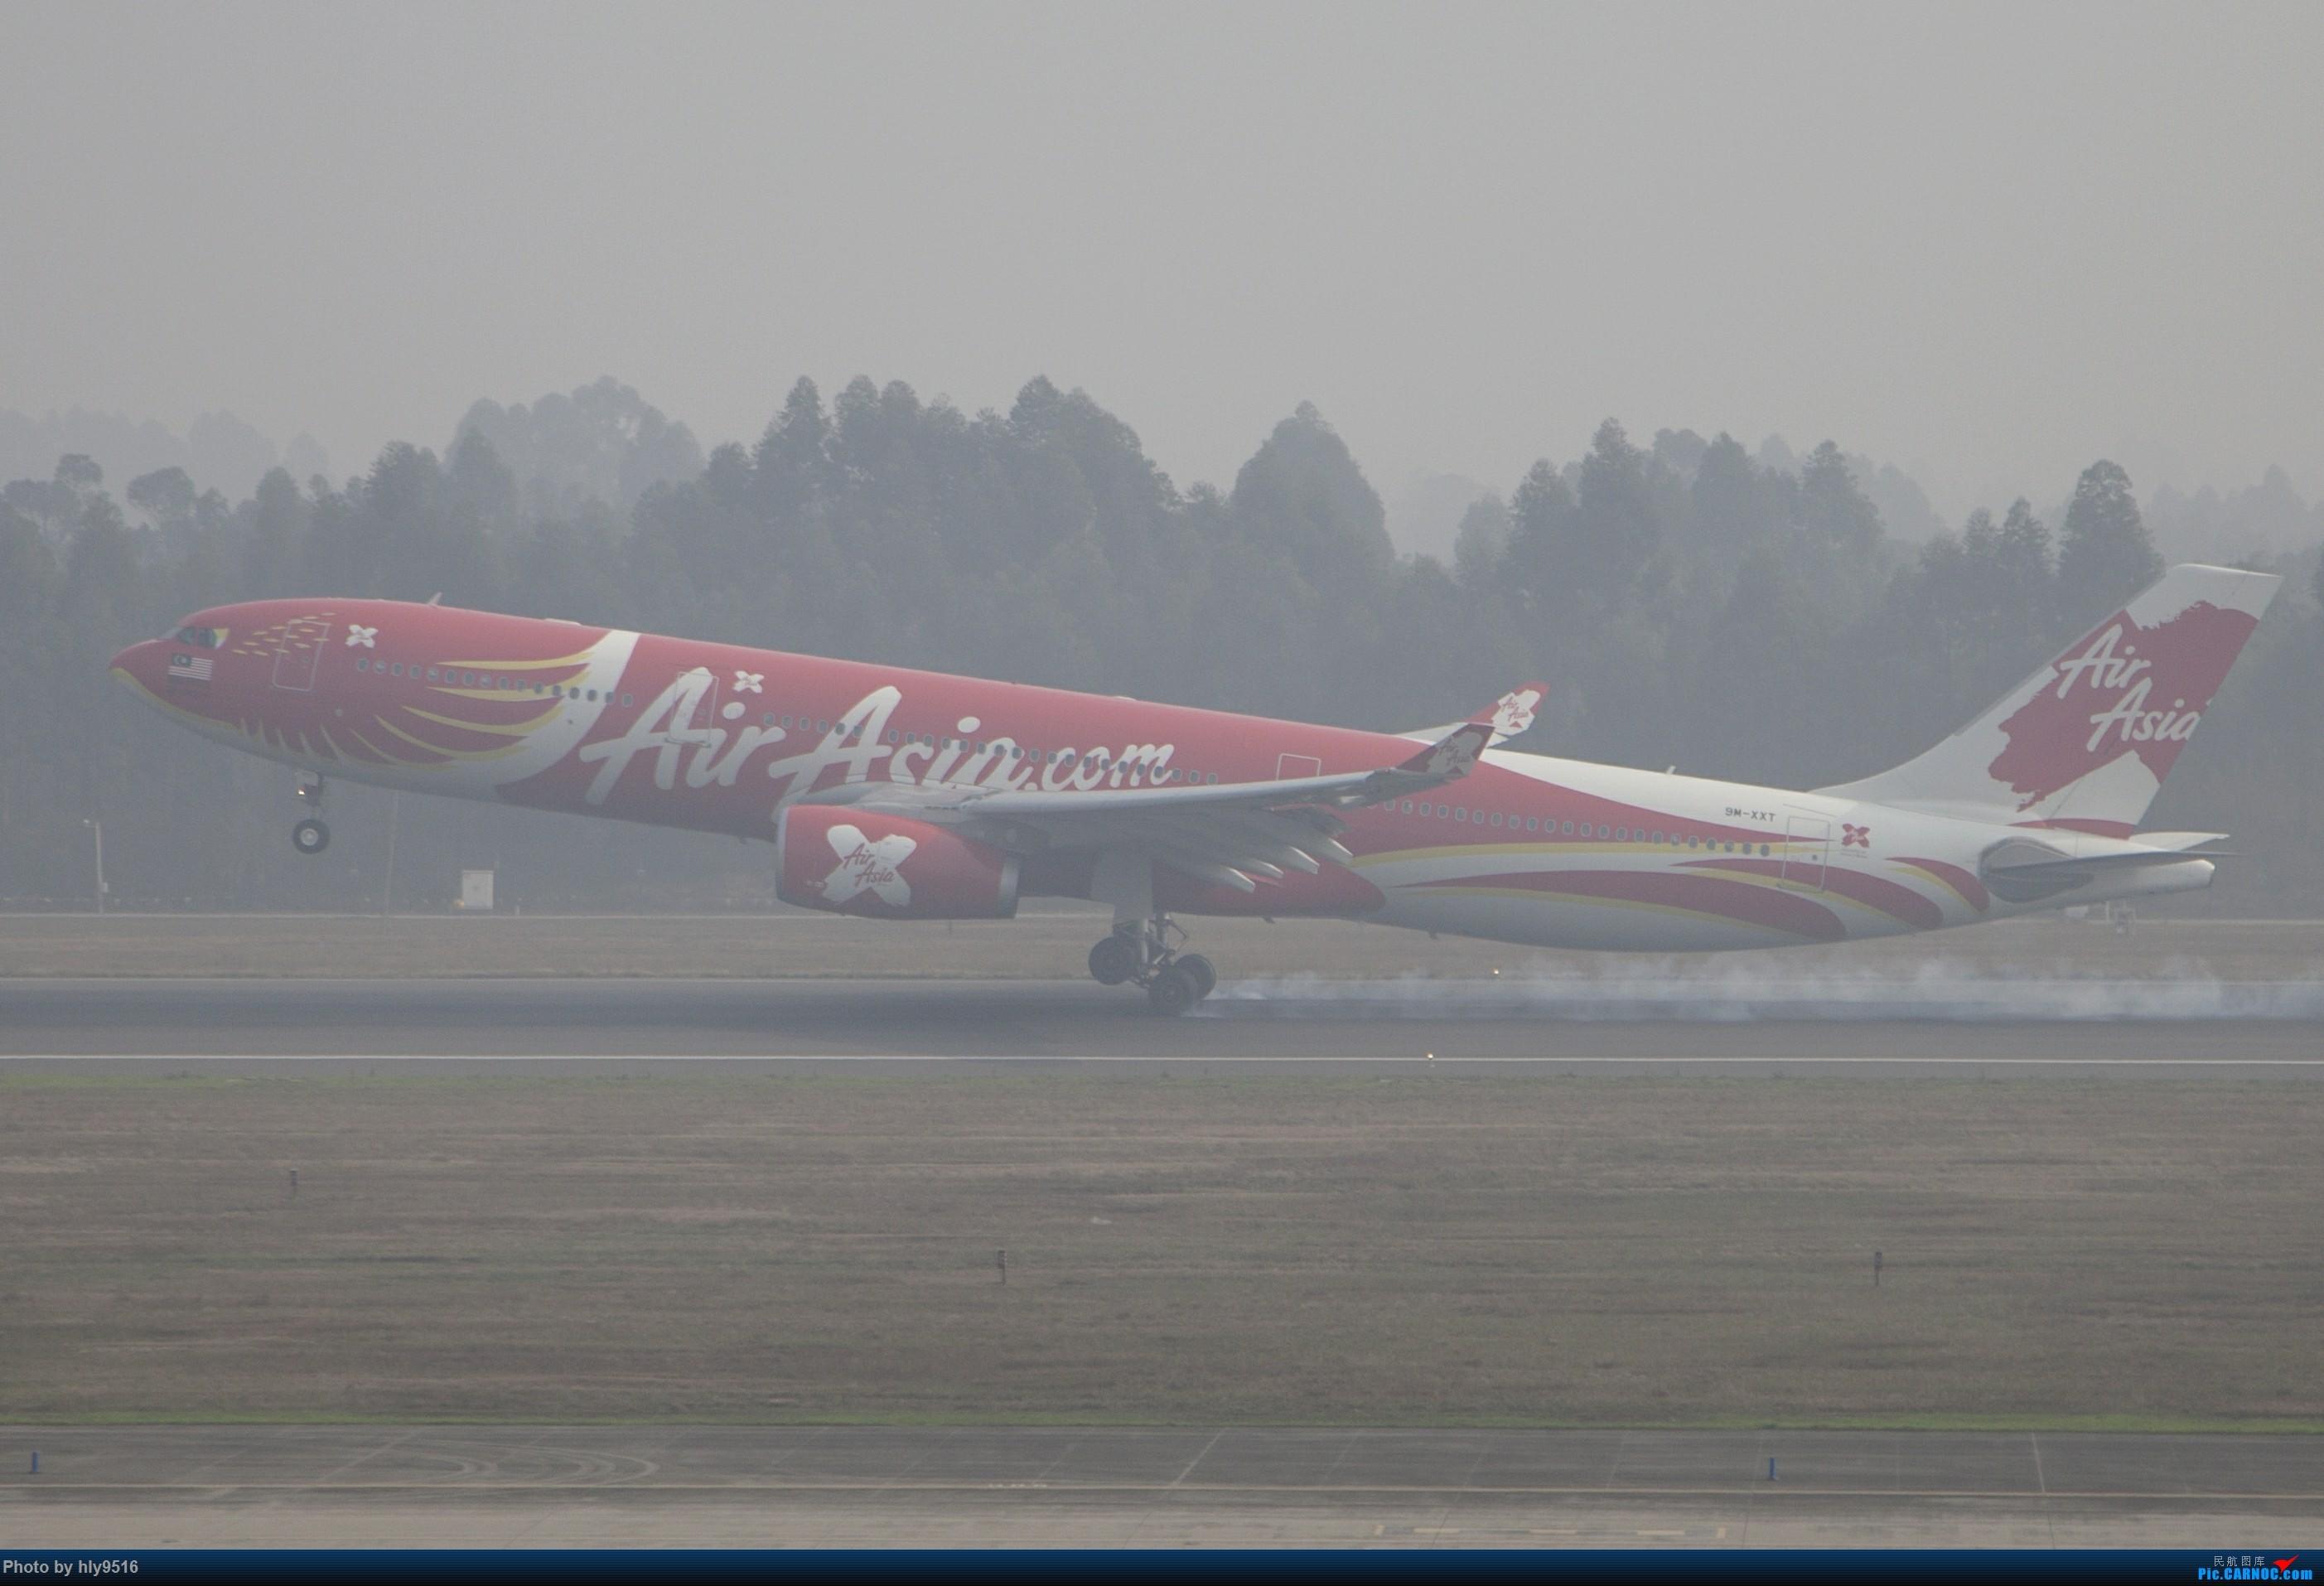 Re:[原创]【CTU】去年冬天老图一组,论成都的极致雾霾烂天 AIRBUS A330-300 9M-XXT 中国成都双流国际机场